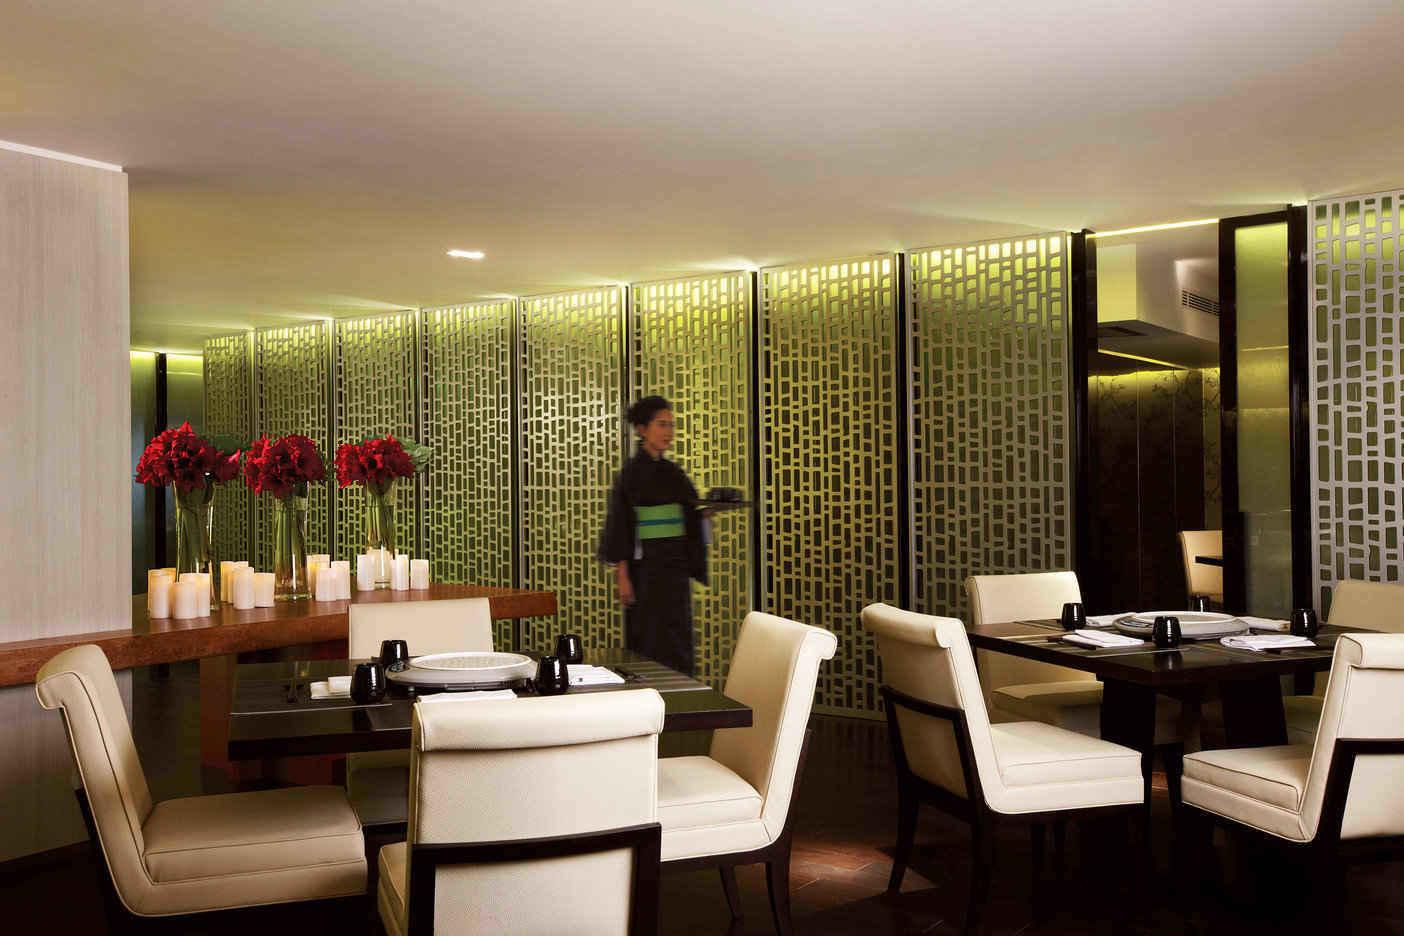 Interior 1 at Aoki Japanese Cuisine